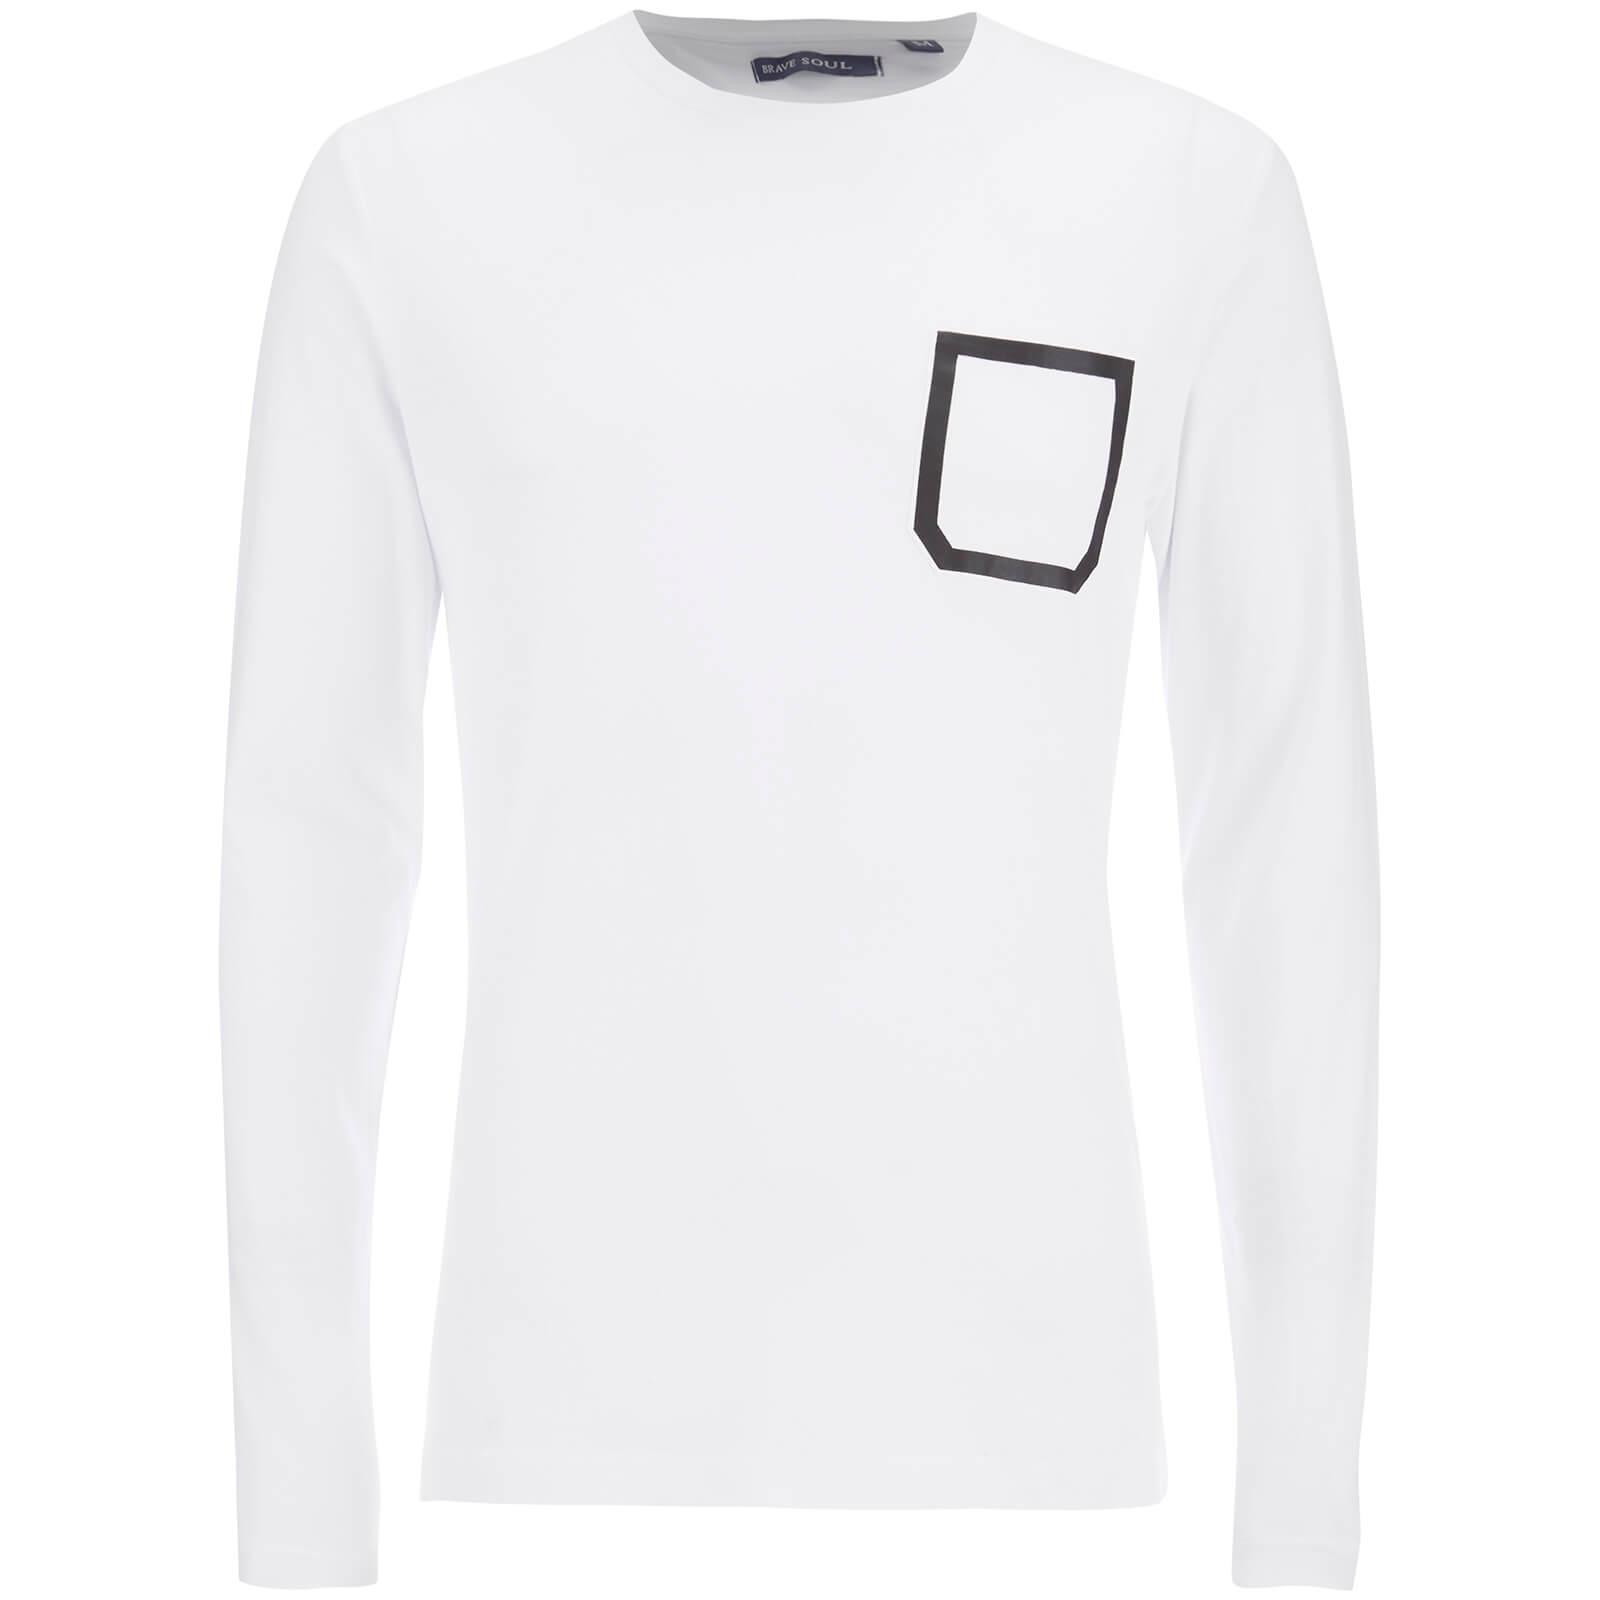 b67c2a1eb62e Description. Men's long sleeve T-shirt from Brave Soul. Cut from pure cotton,  the 'Activist' top features a simple crew neck ...